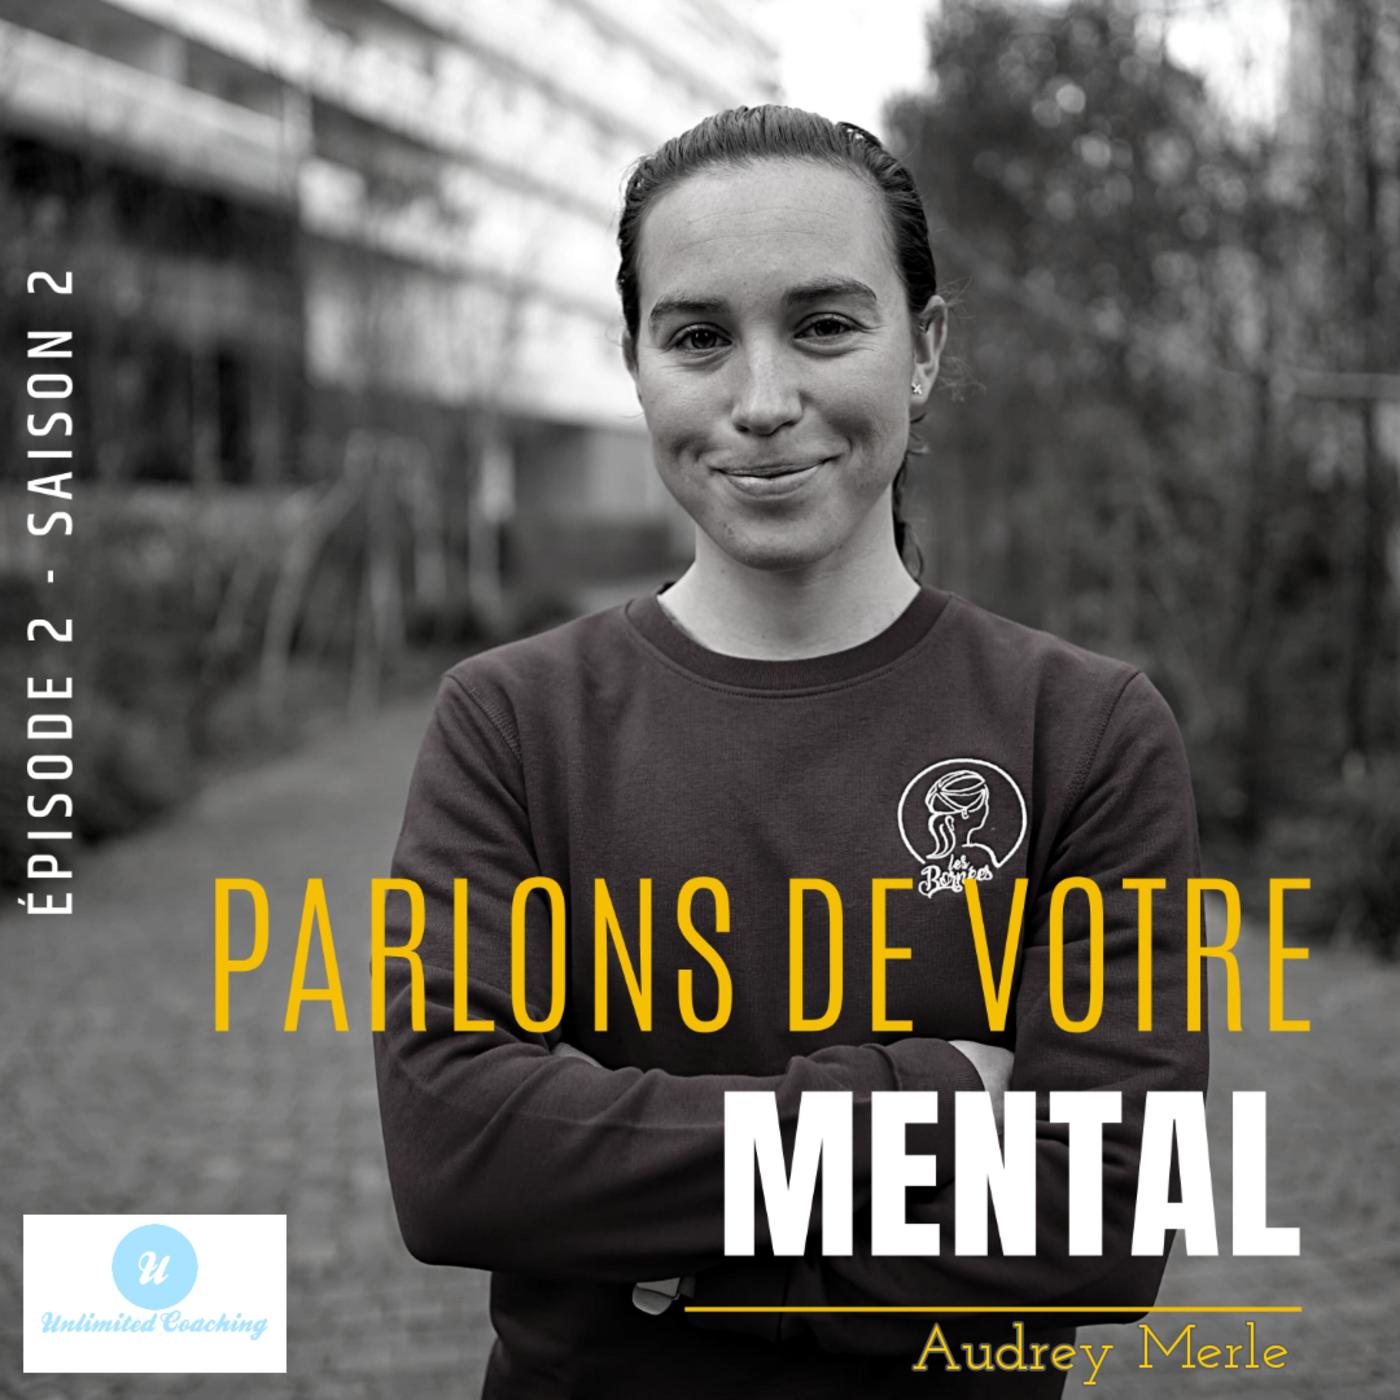 Audrey Merle - Triathlète internationale 🏃🏊🚴 & Ambassadrice 🚴Les Bornées🚴